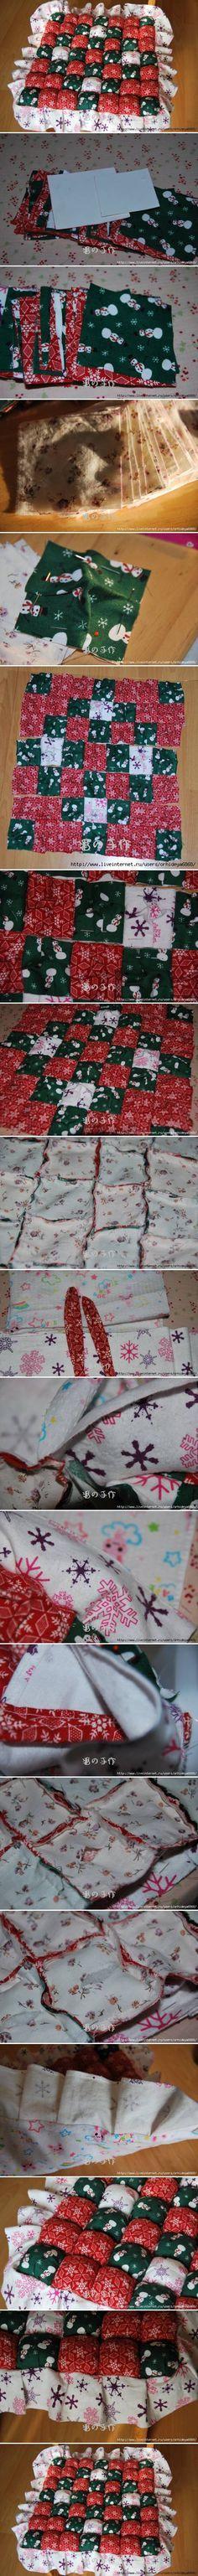 DIY Patchwork Pillow DIY Projects